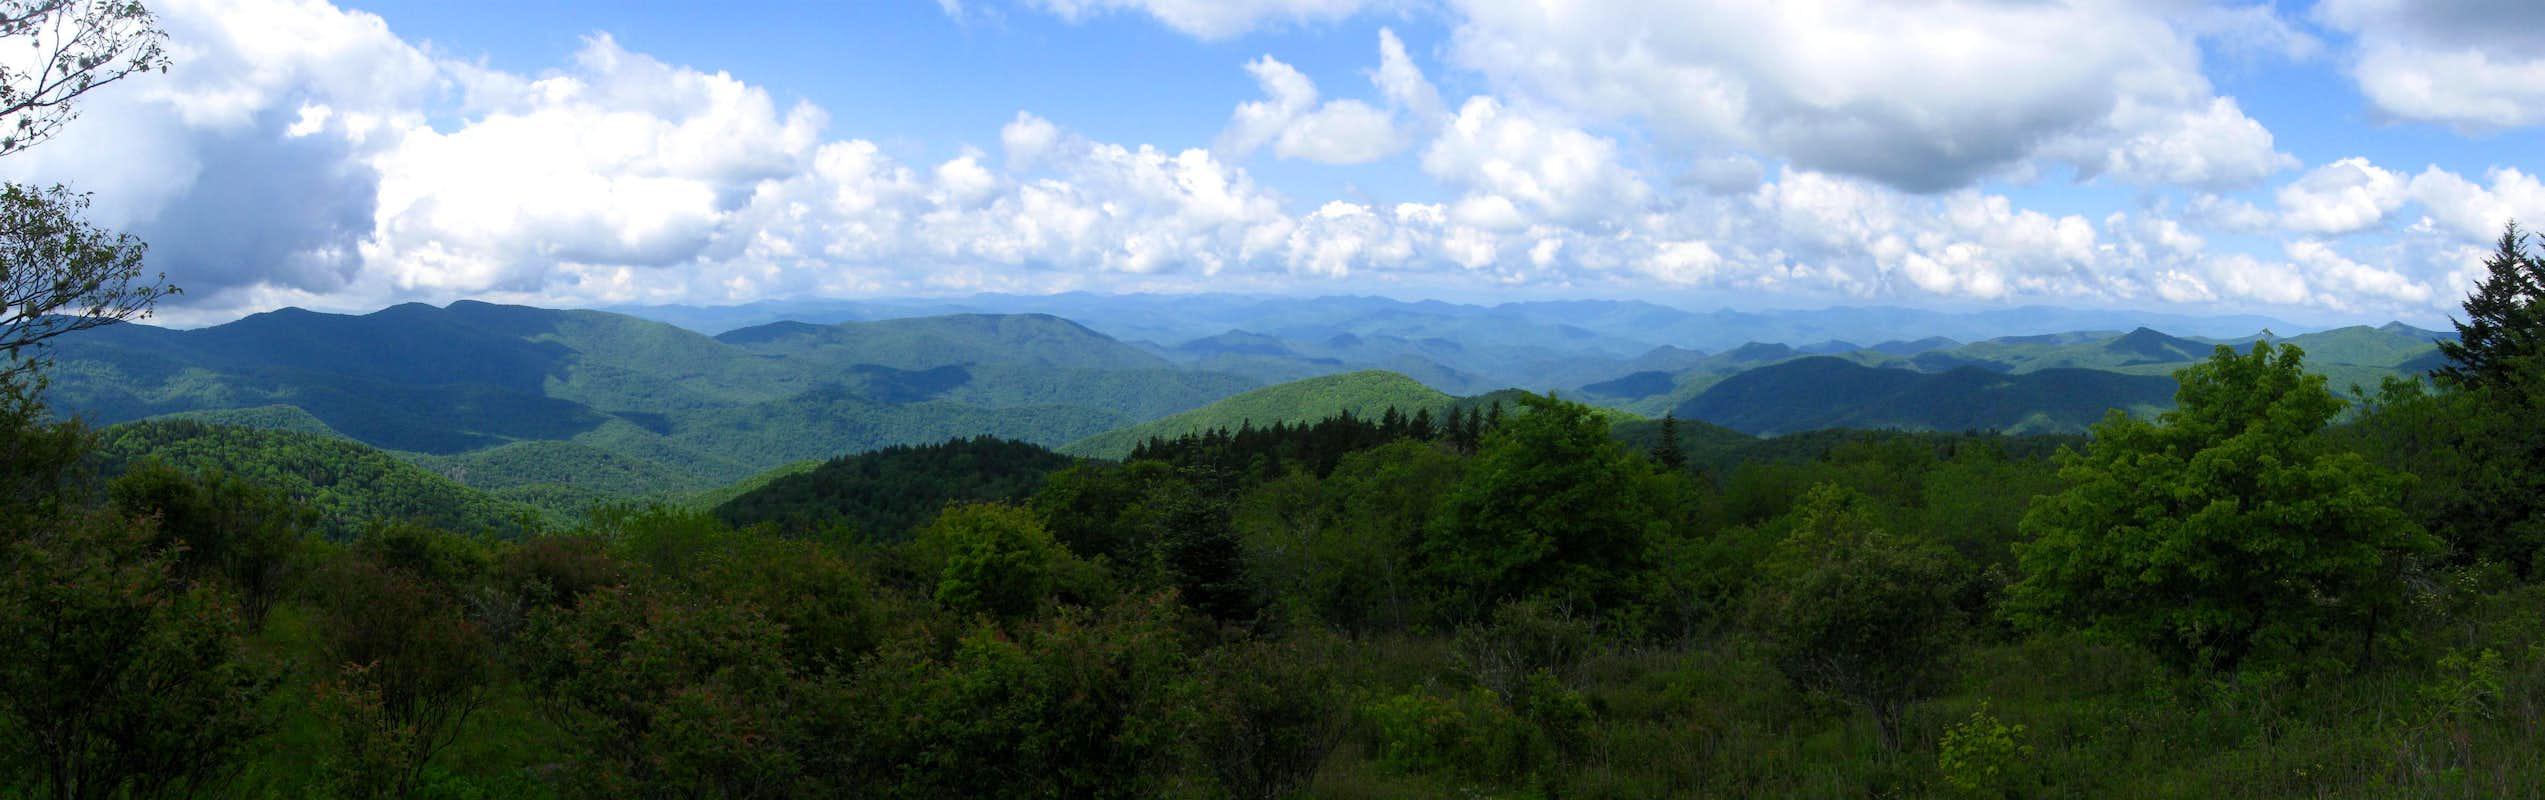 Reinhart knob richland balsam loop trip reports for Balsam mountain